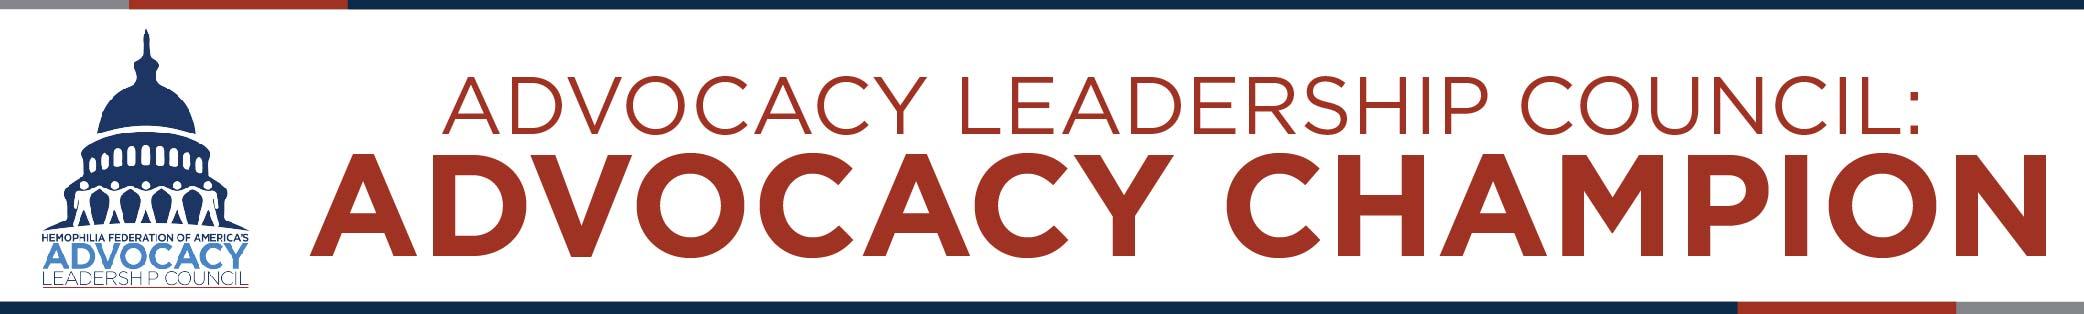 Advocacy Leadership Council_Advocacy Champion Application